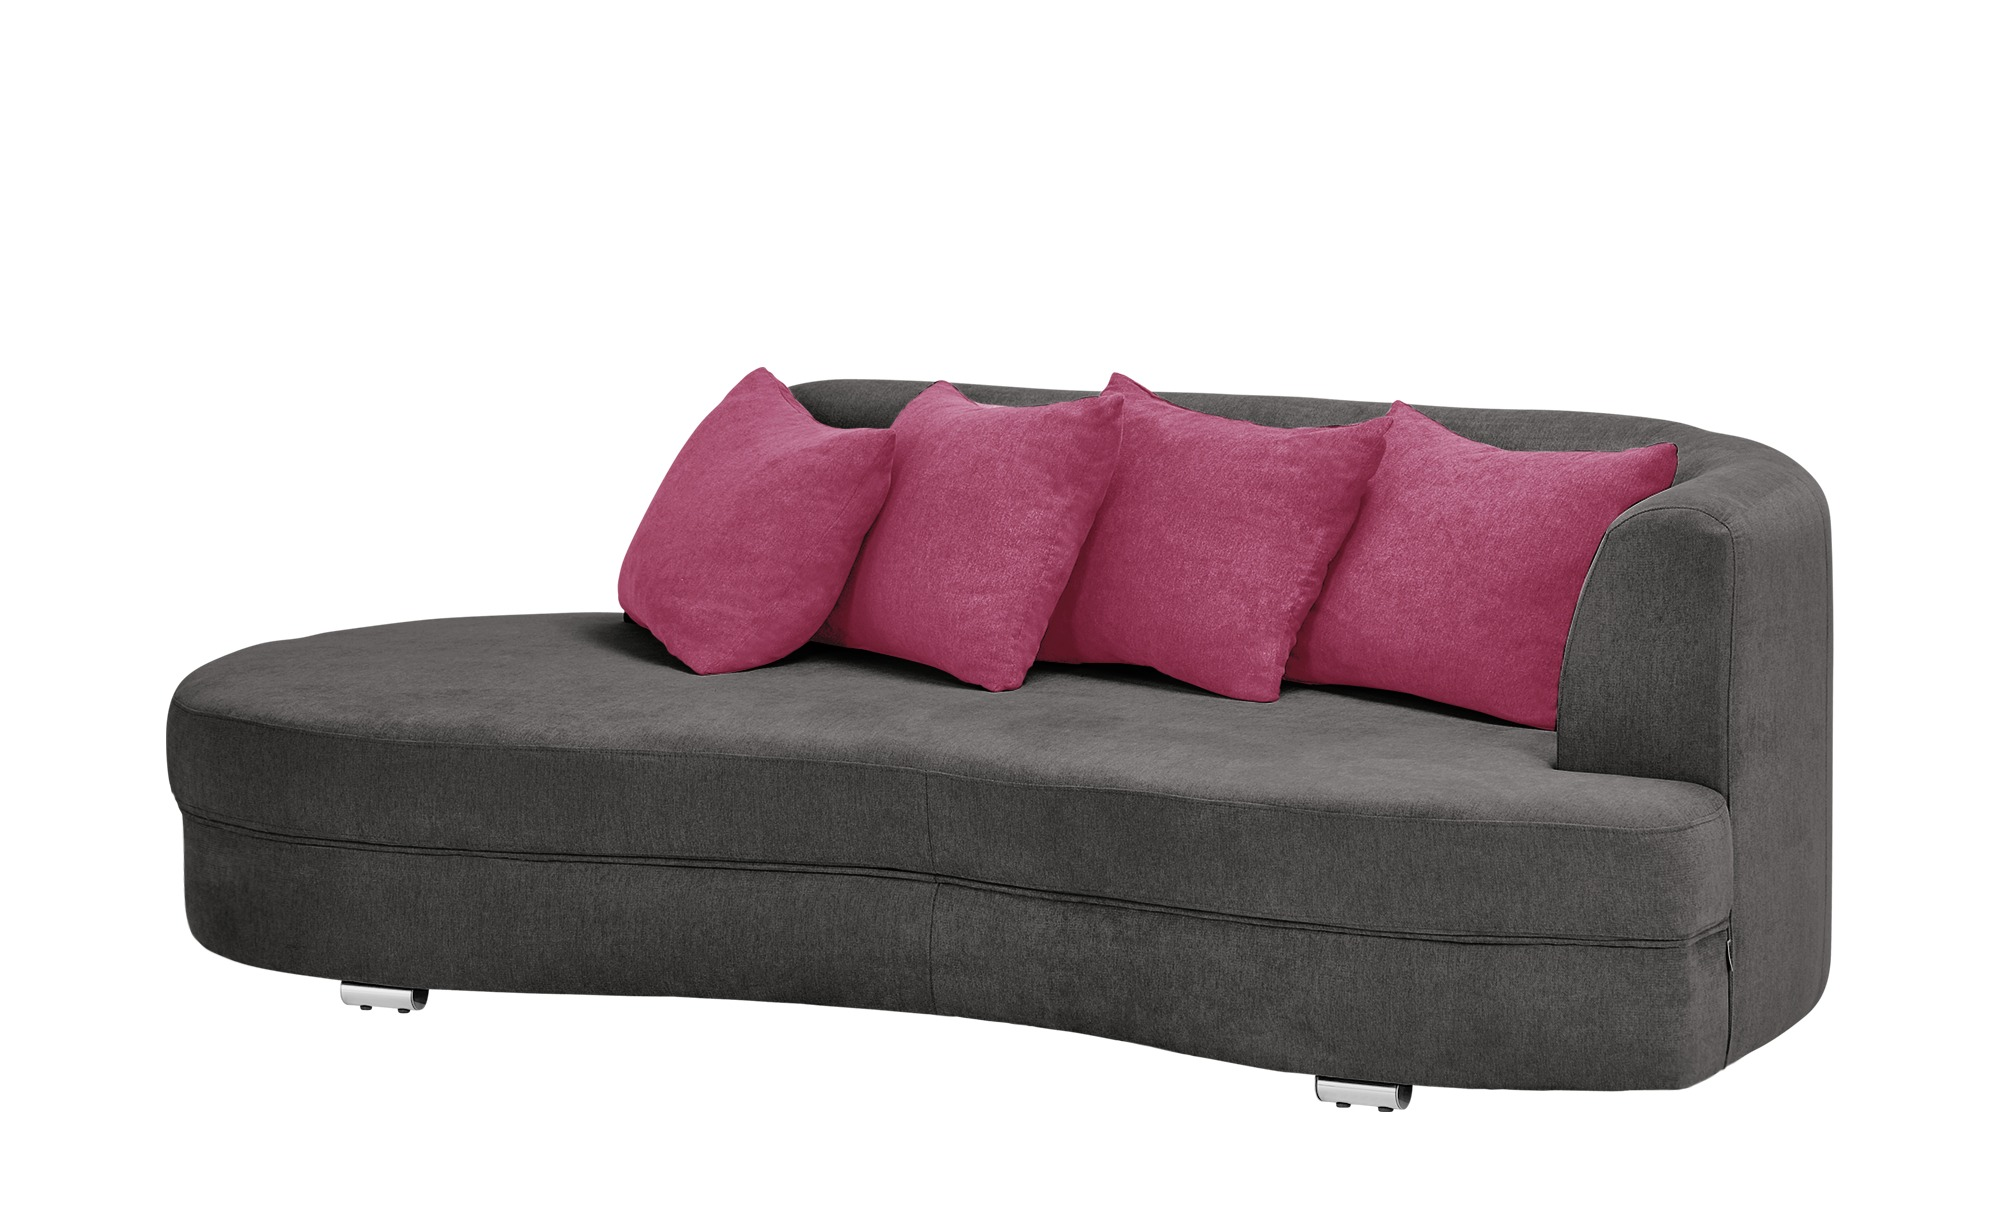 smart Big Sofa Marina, gefunden bei Möbel Höffner